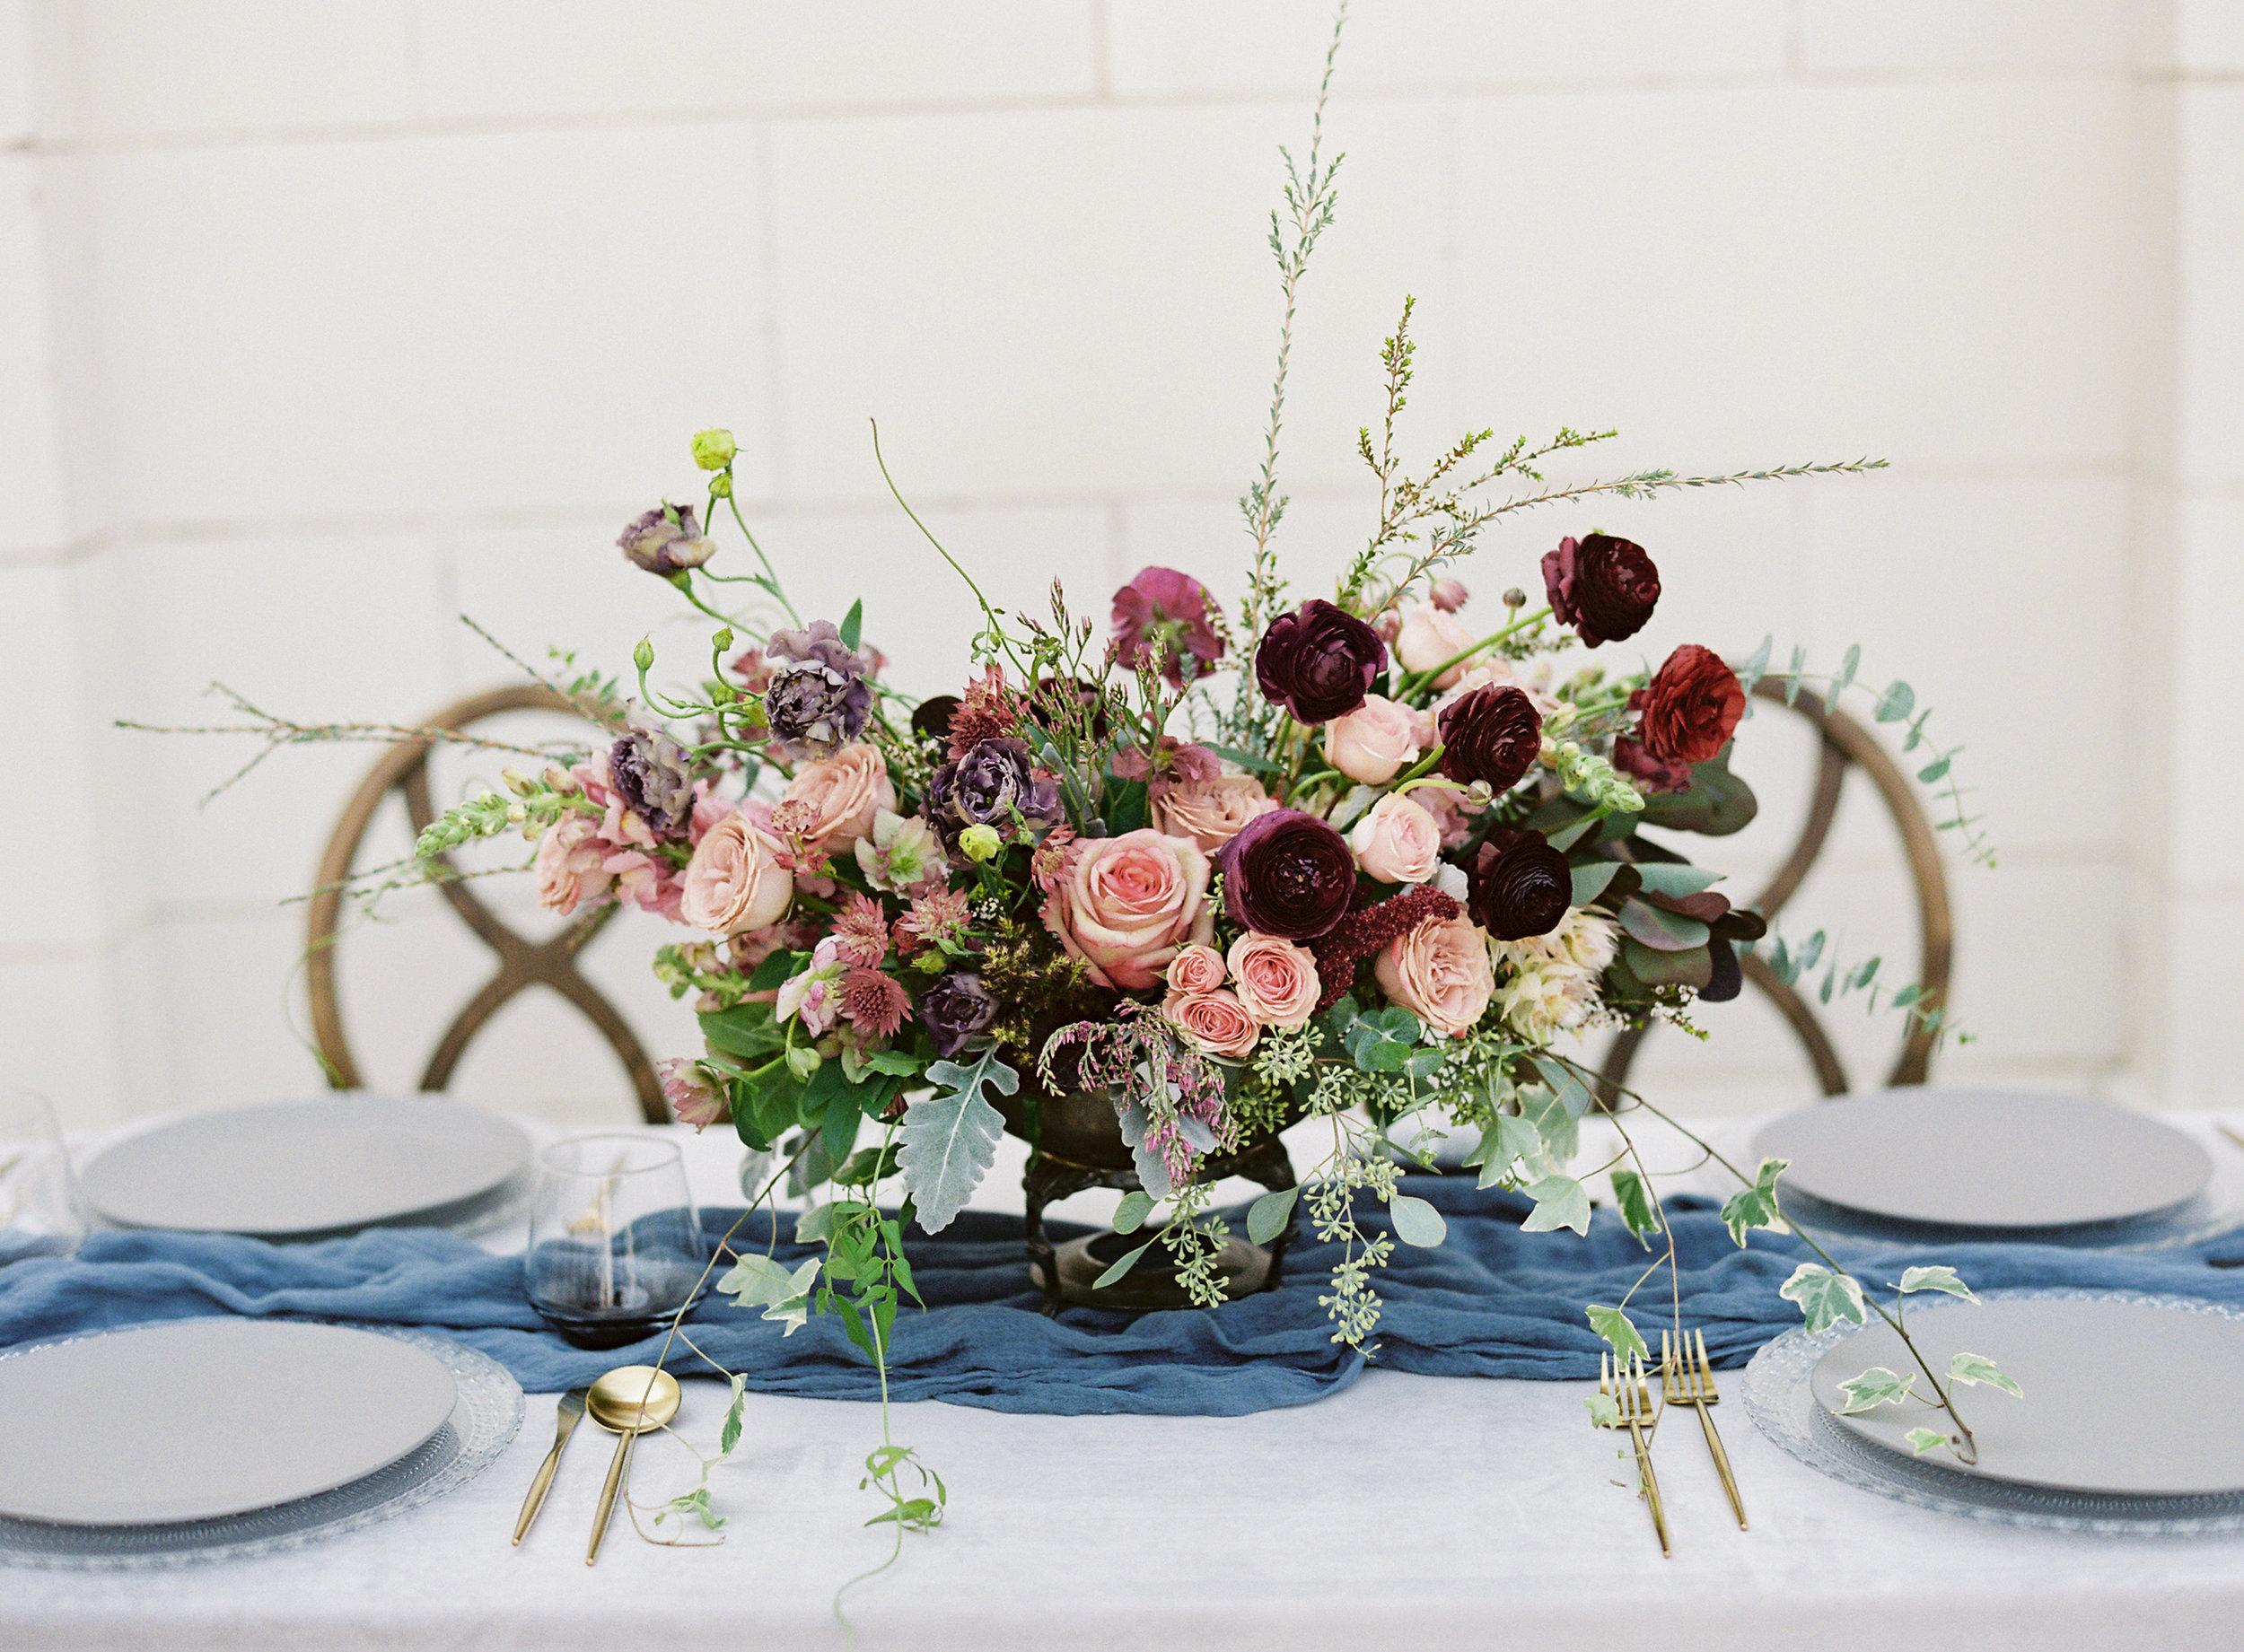 la-rue-floral-fall-wedding-flowers.jpg